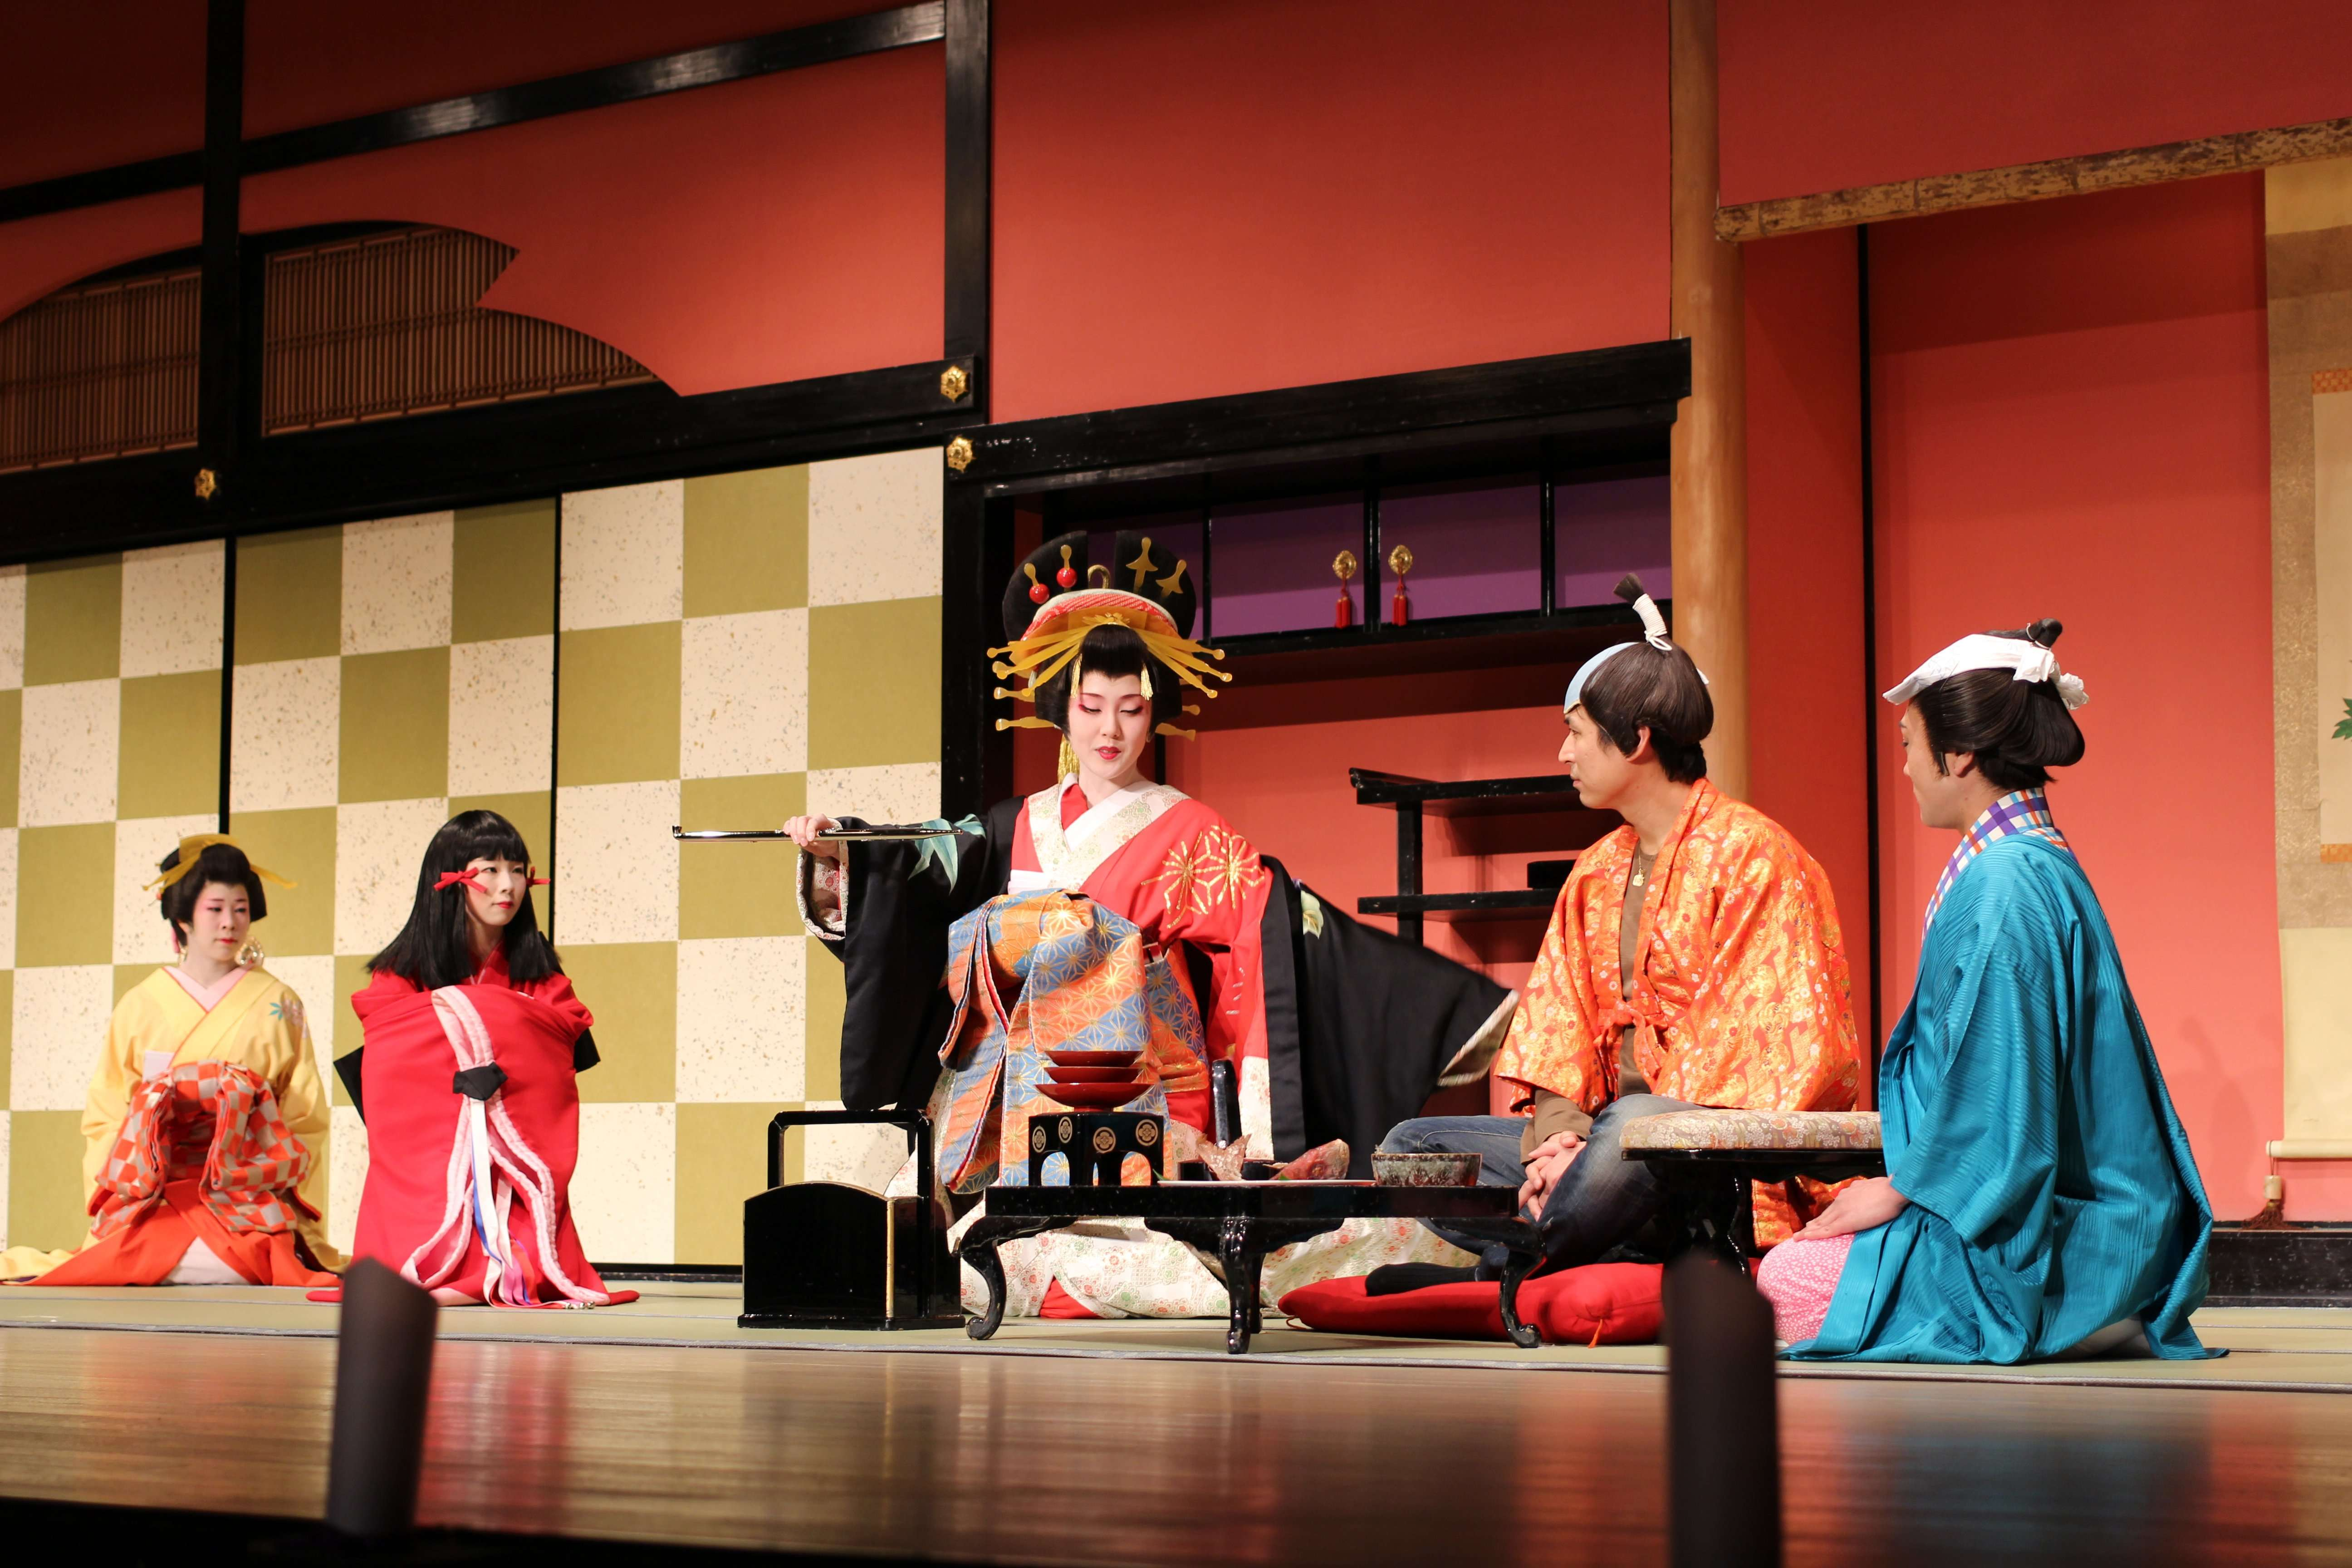 Geisha show: an acting Geisha demonstrates the ways of the geisha